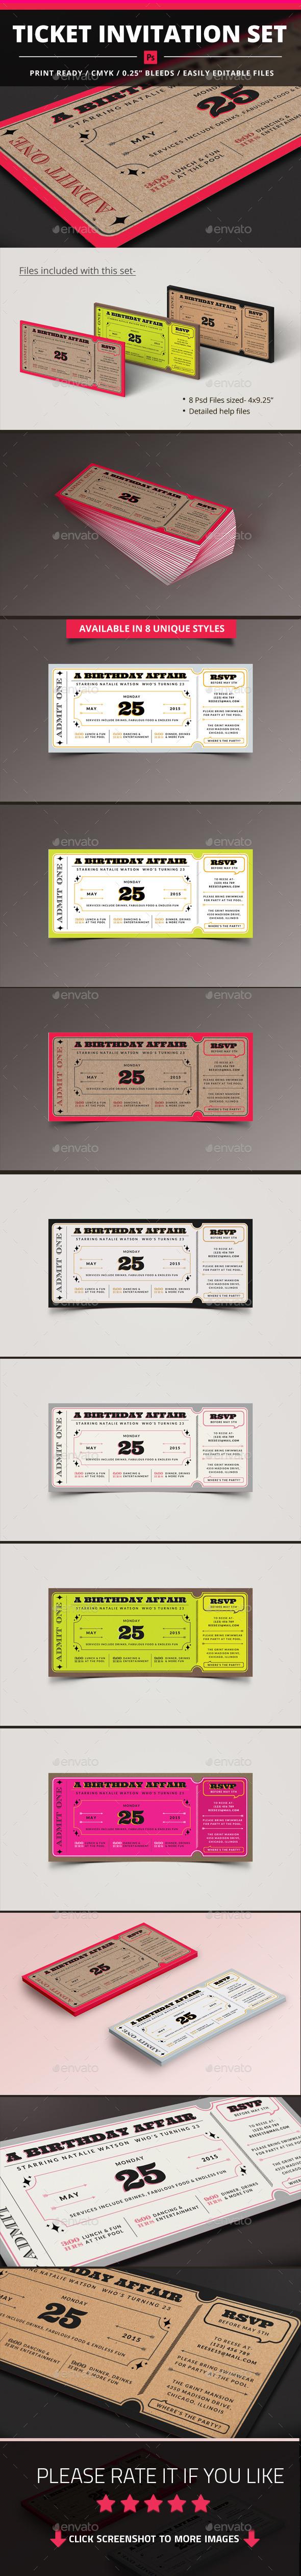 Ticket Invitation Set - Invitations Cards & Invites